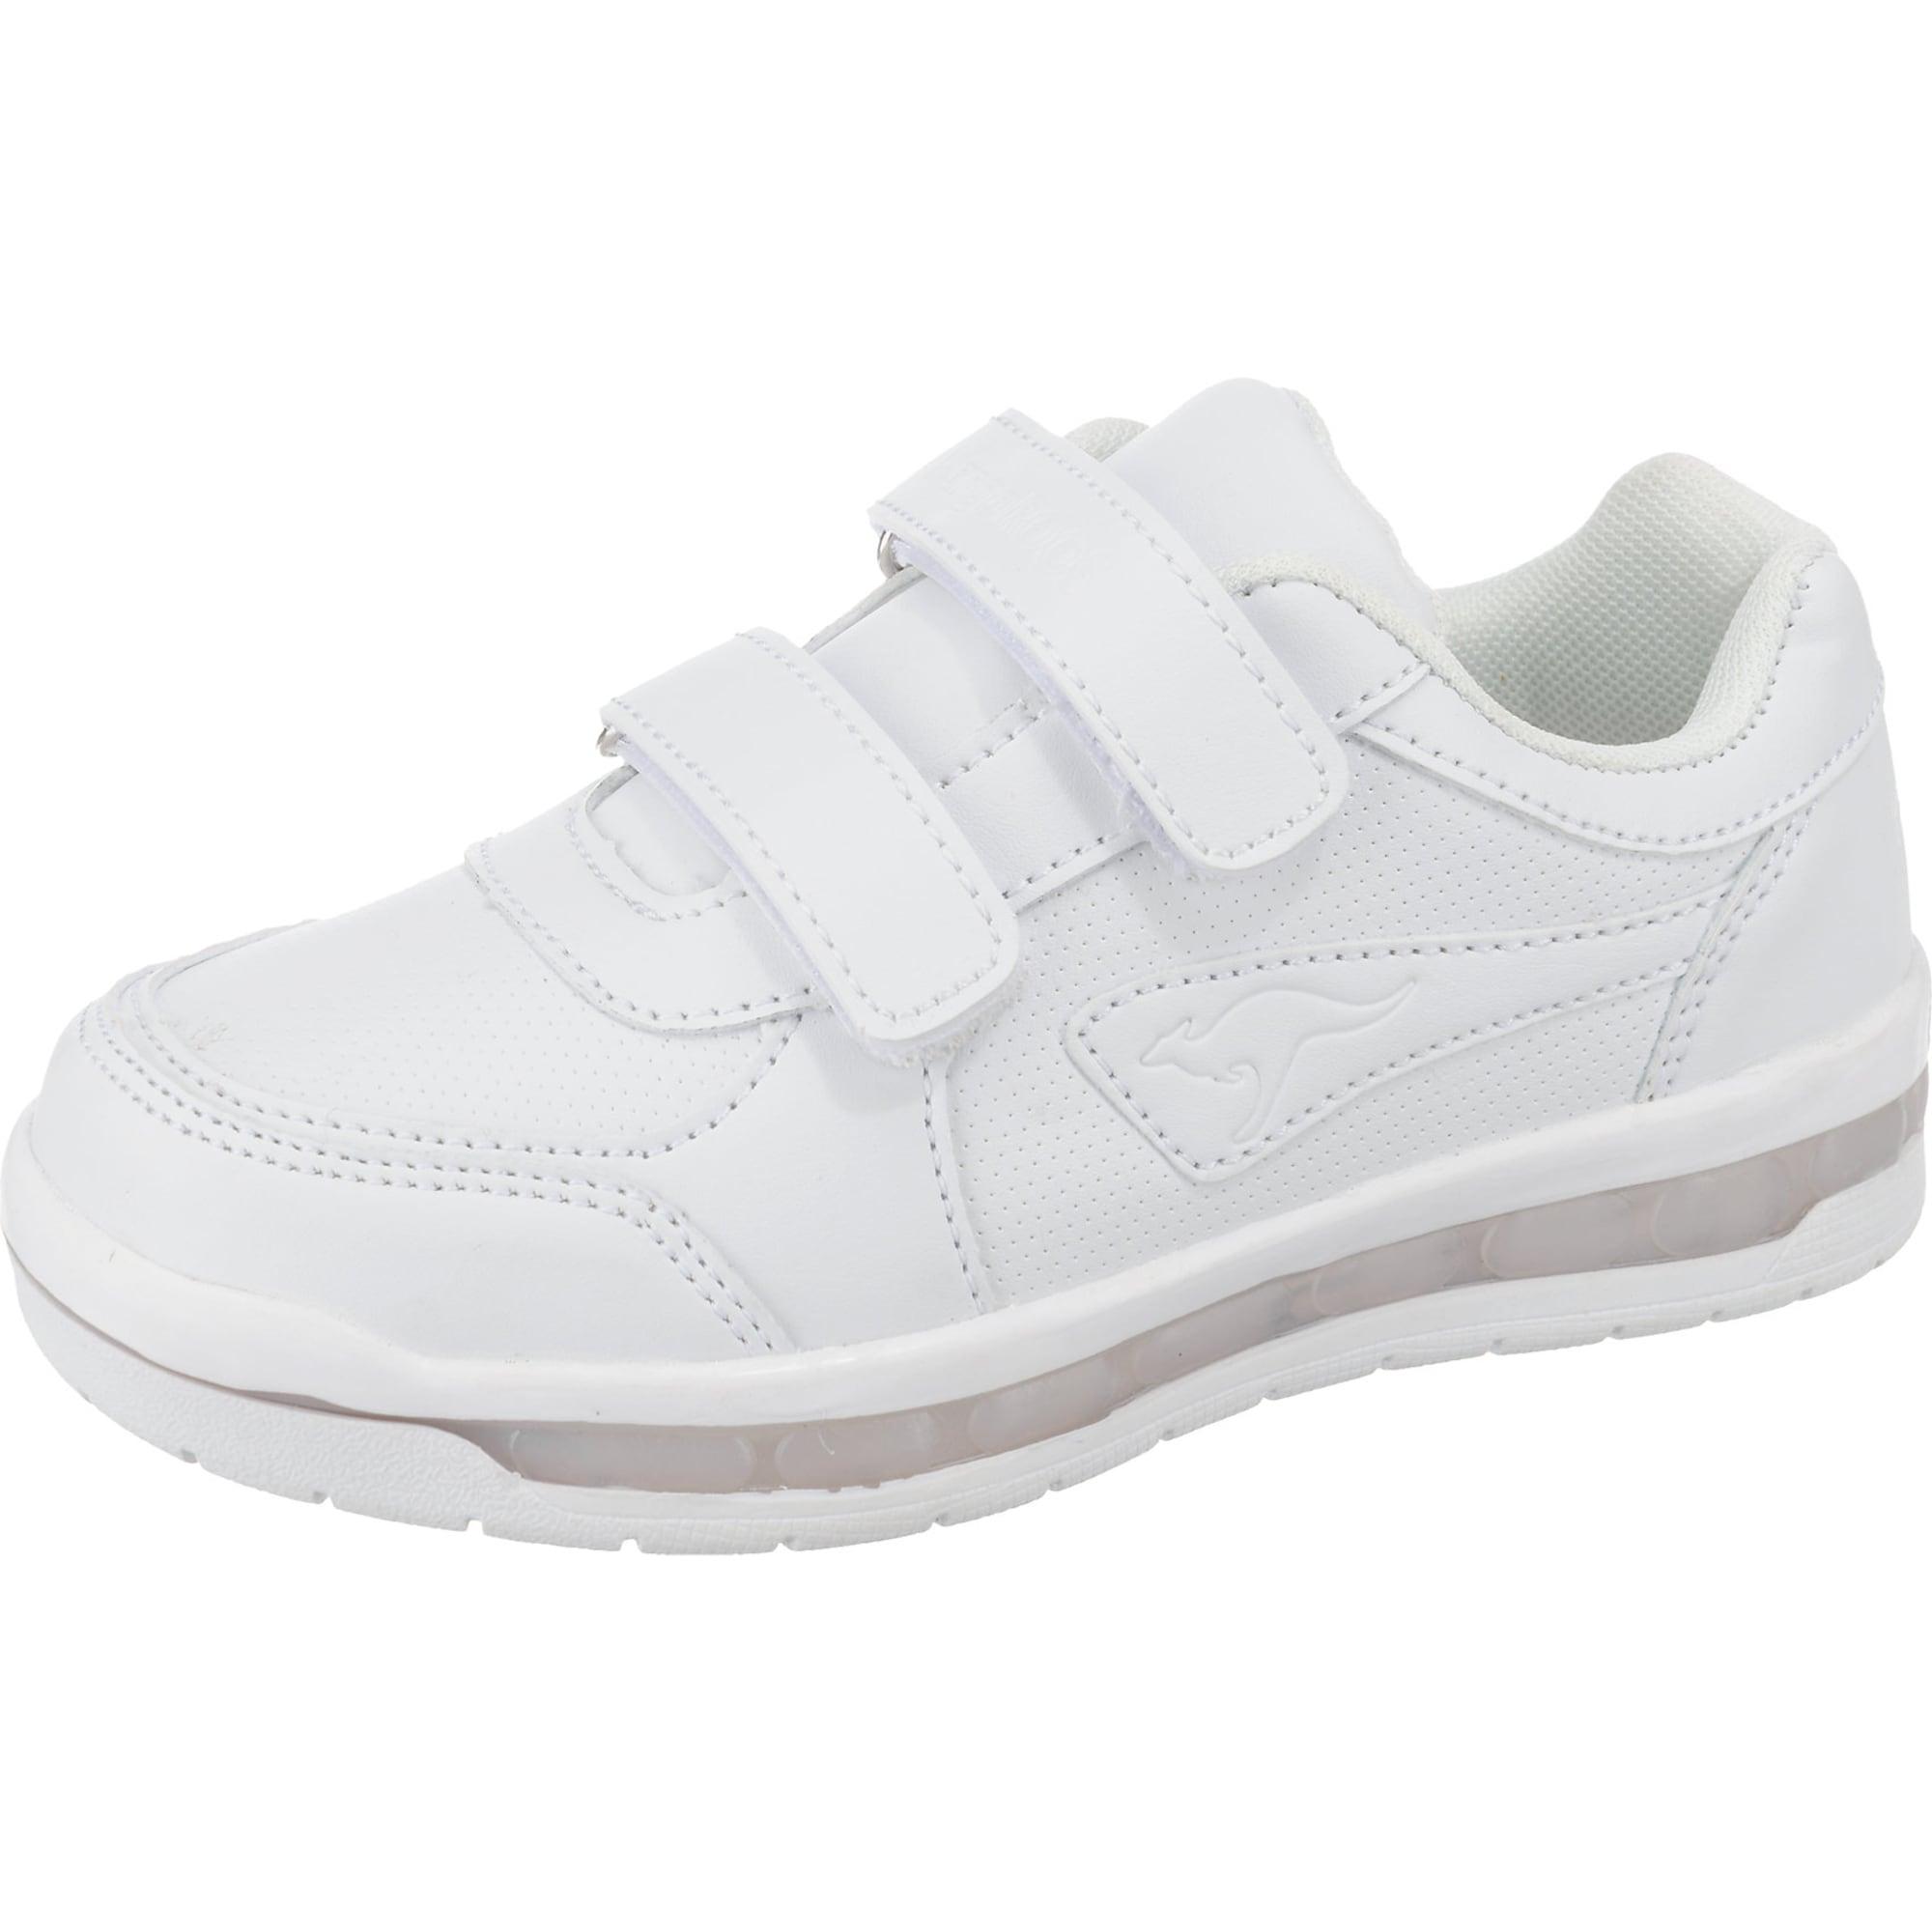 best service 7901b 5a9e5 AboutYou | Kinder,Jungen KangaROOS KangaROOS Sneakers Low ...